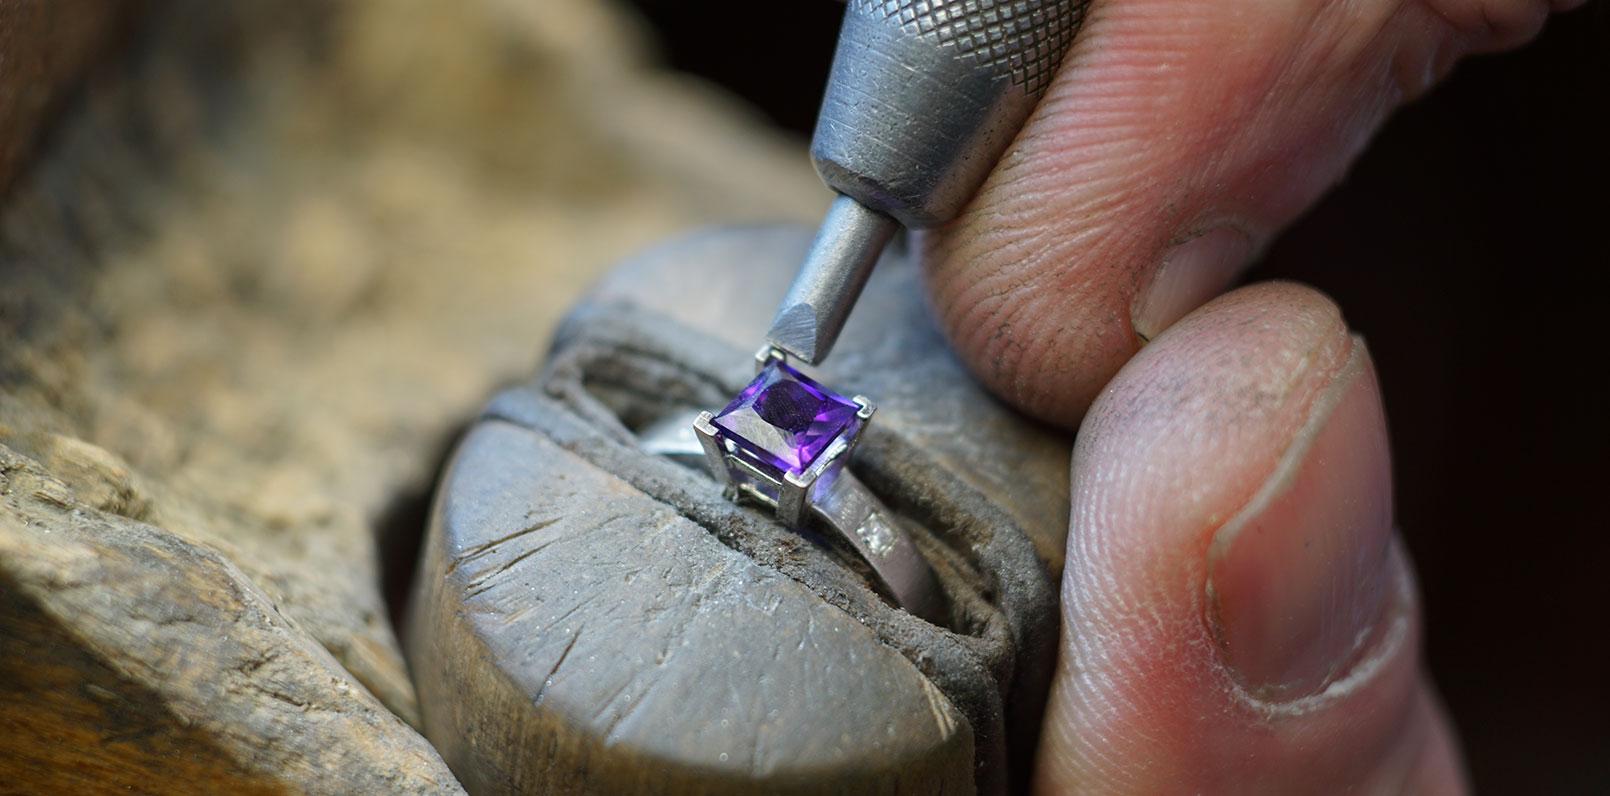 harriet-kelsall-bespoke-jewellery-amethyst-engagement-ring-stone-setting[1].jpg